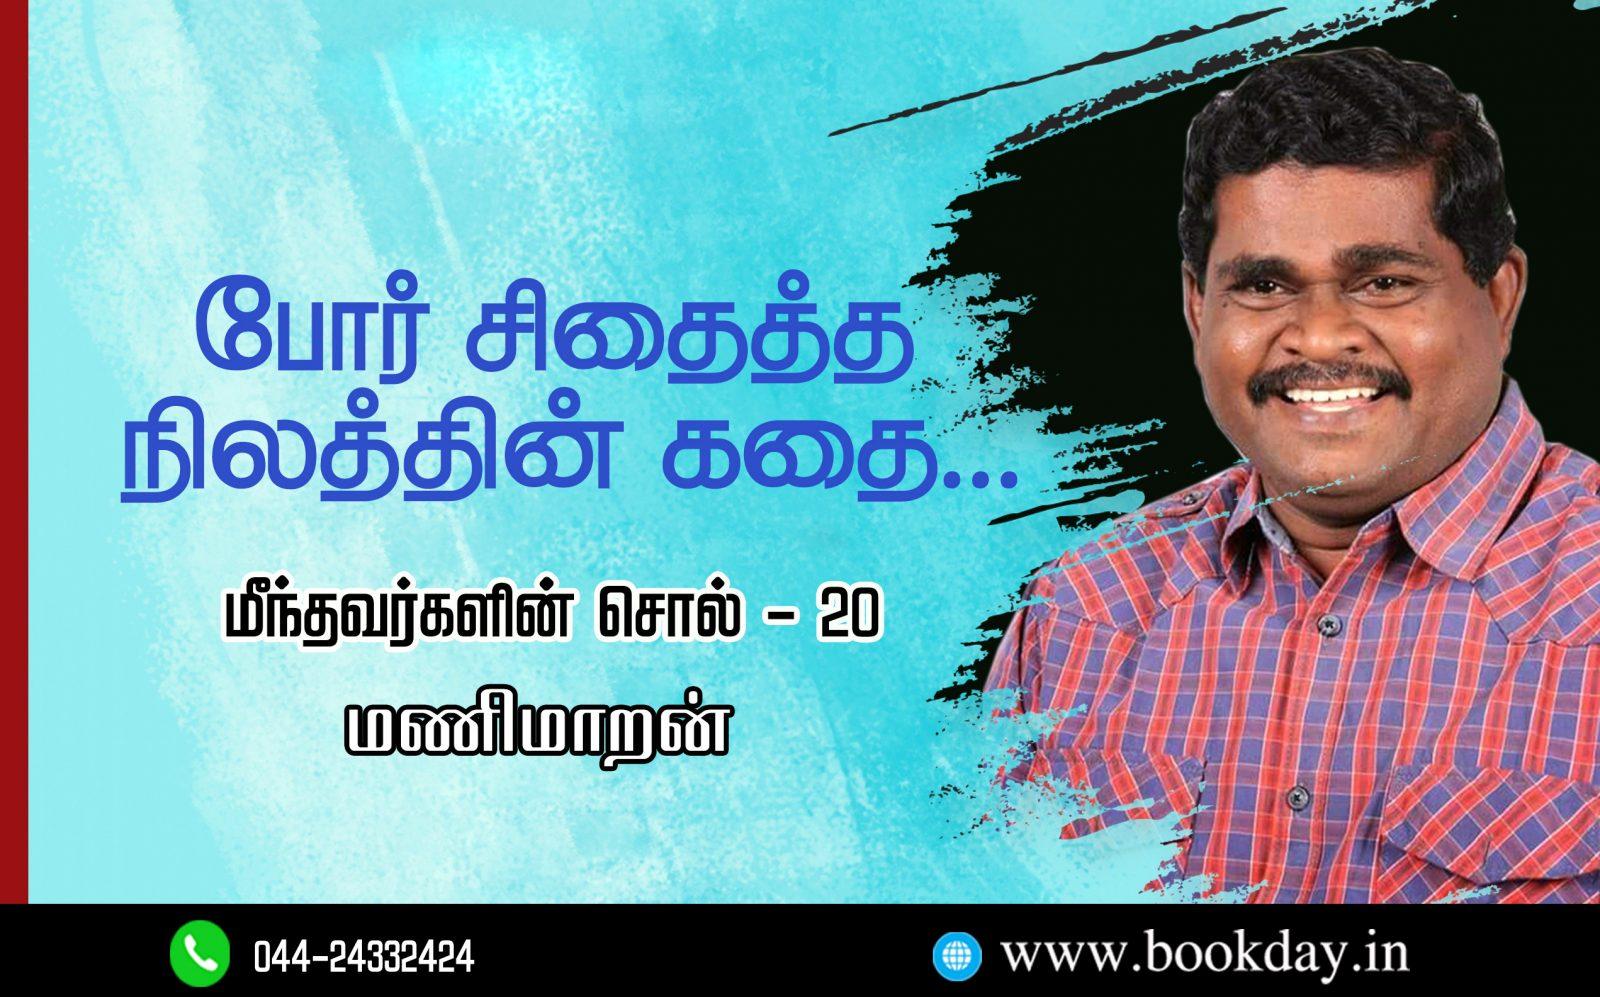 Malayaga Tamilar, Up-Country Tamils Story Oriented 20th Series Article Tho. Pathinathan's Porin Marupakkam By Writer Manimaran.